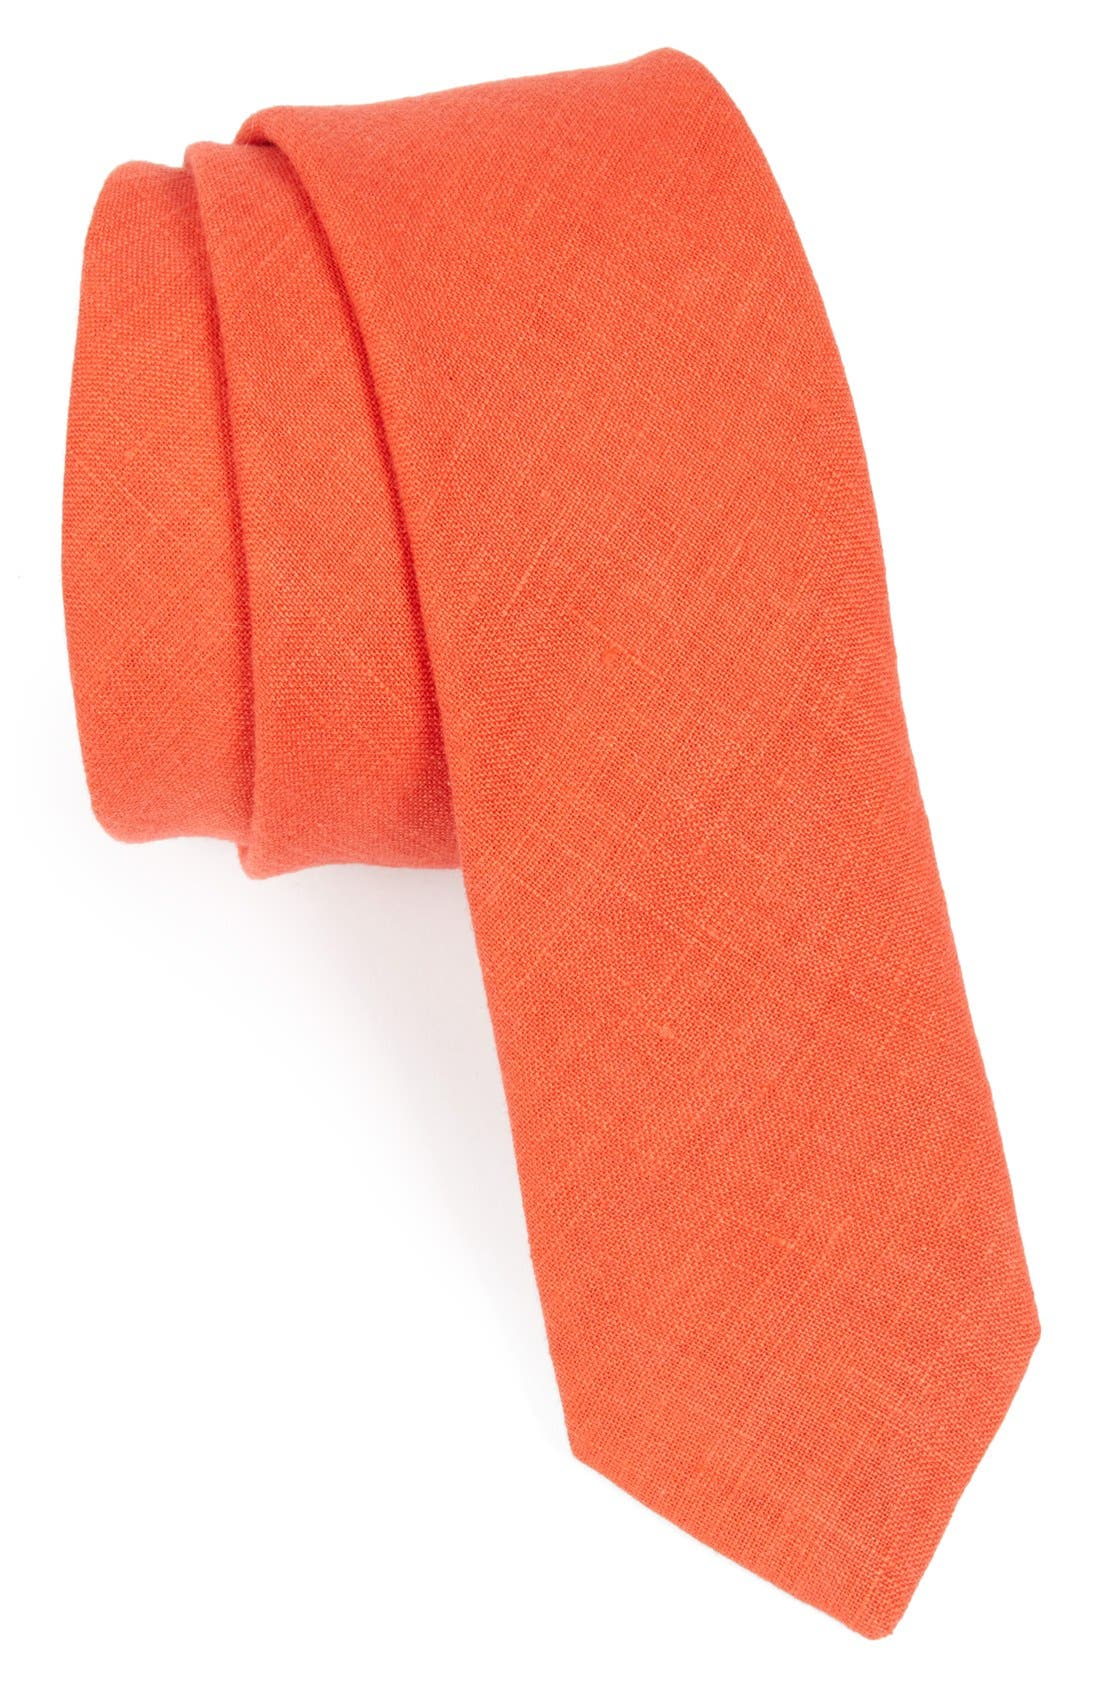 Alternate Image 1 Selected - Burberry Prorsum Woven Linen Tie